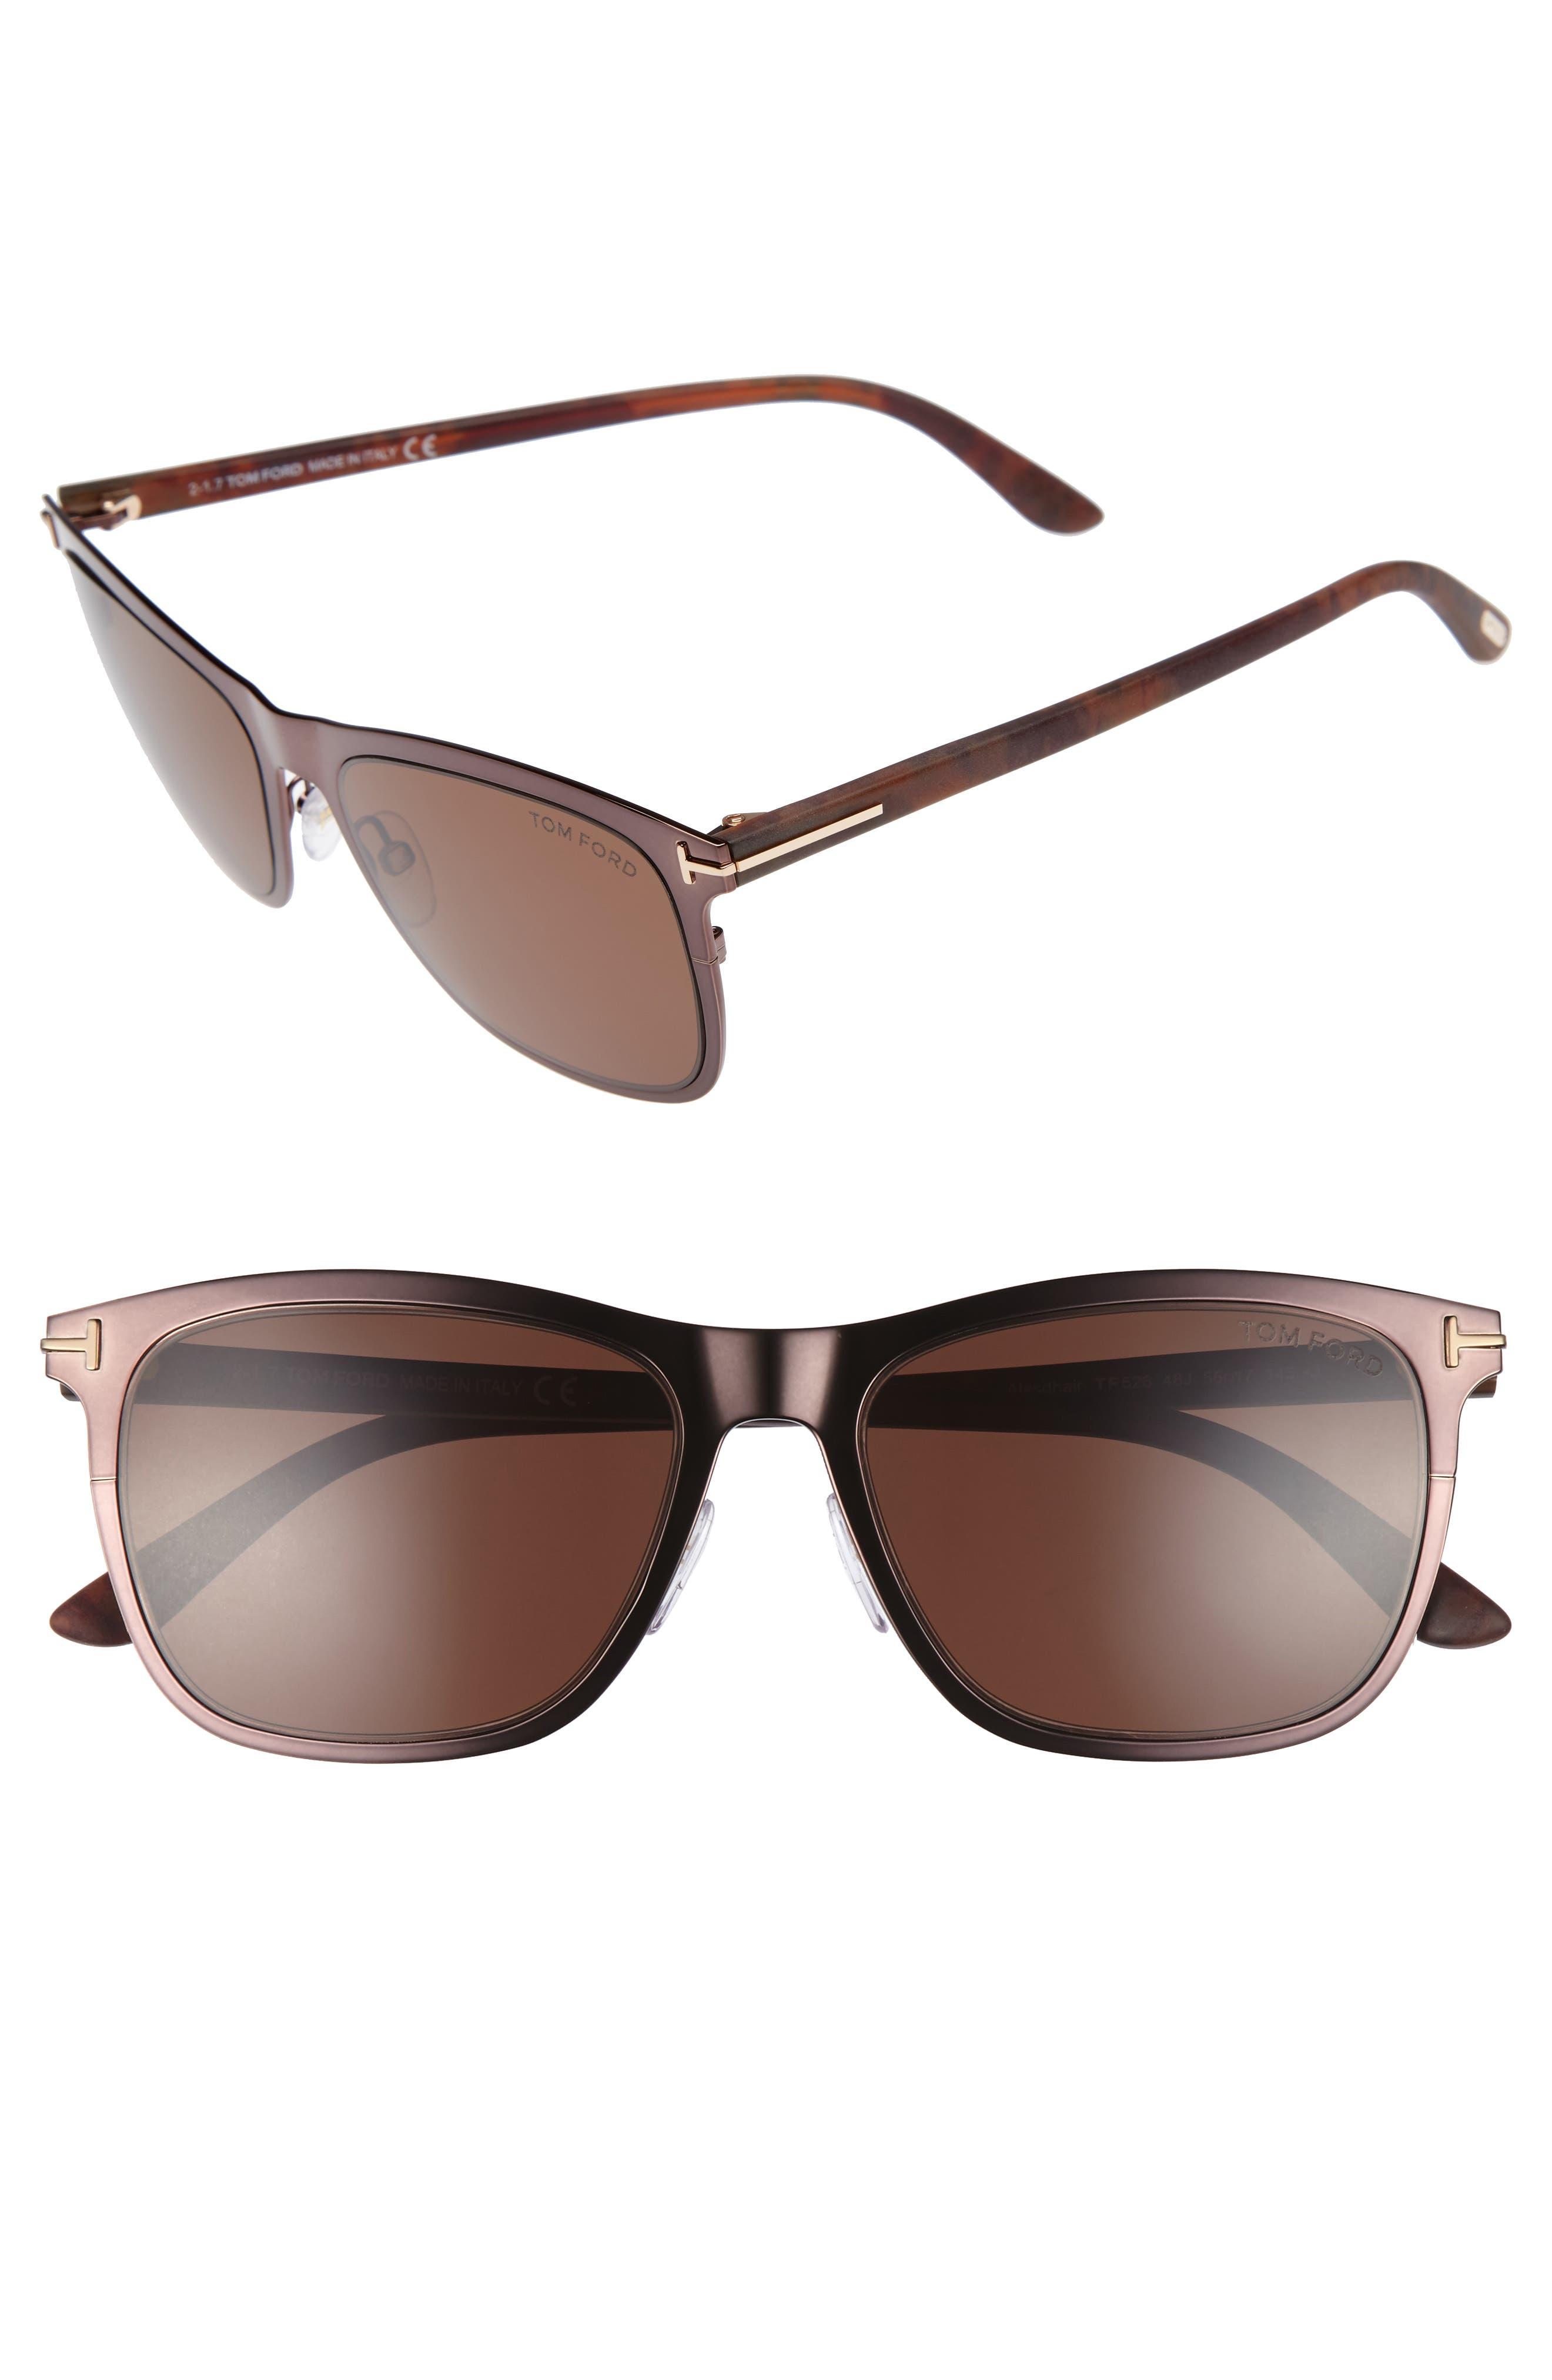 Alasdhair 55mm Sunglasses,                             Main thumbnail 1, color,                             SHINY DARK BROWN/ ROVIEX